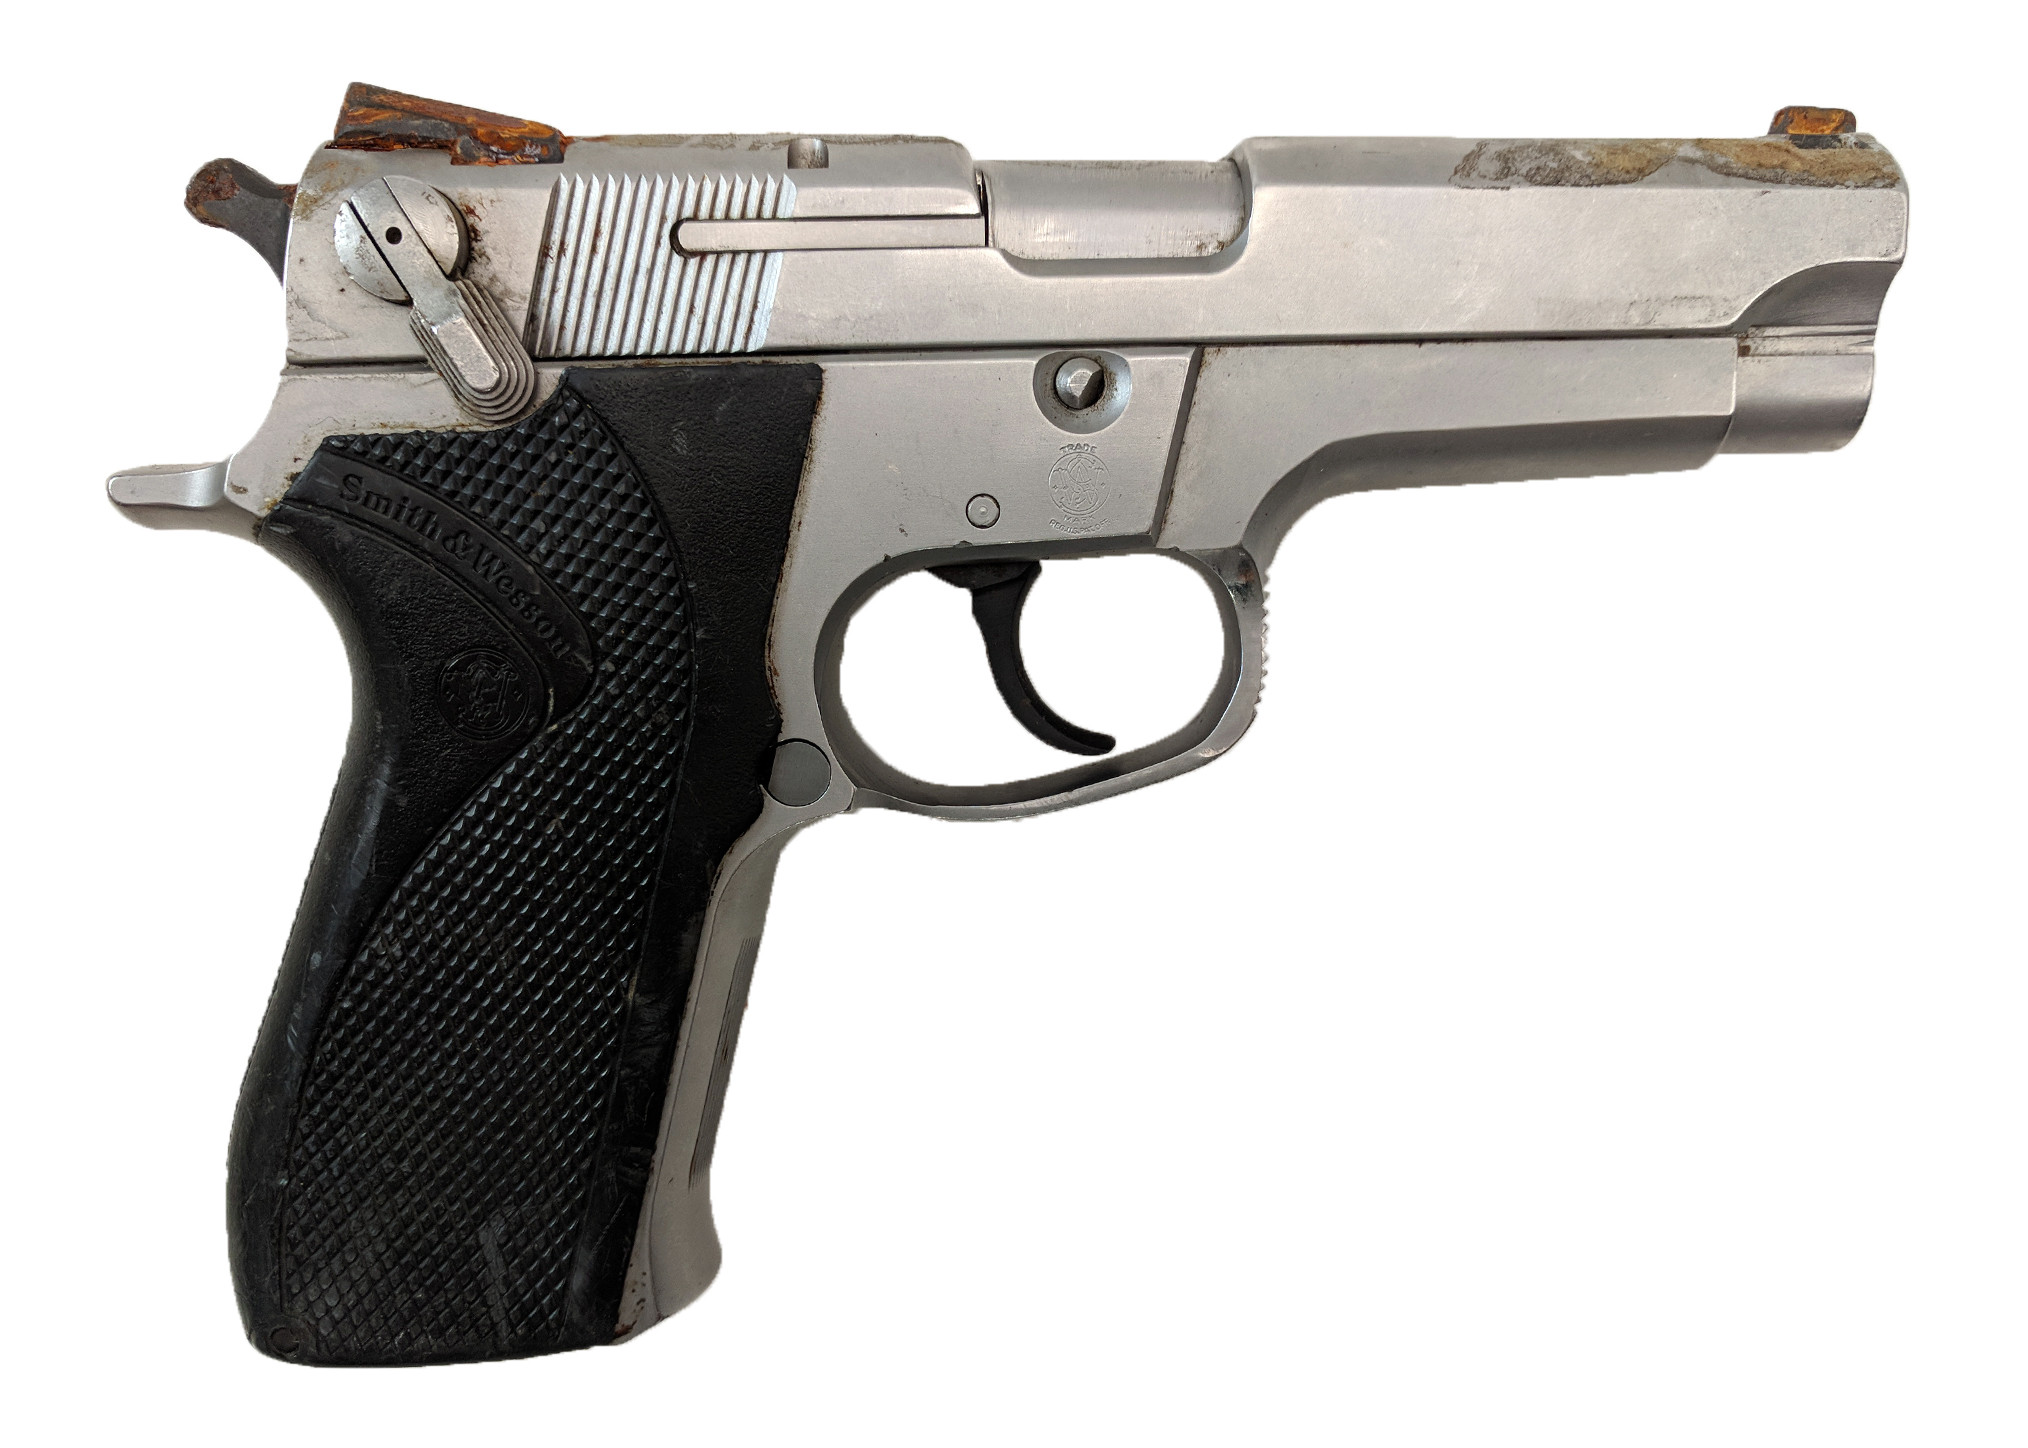 Smith & Wesson 5906, 9mm, no magazine